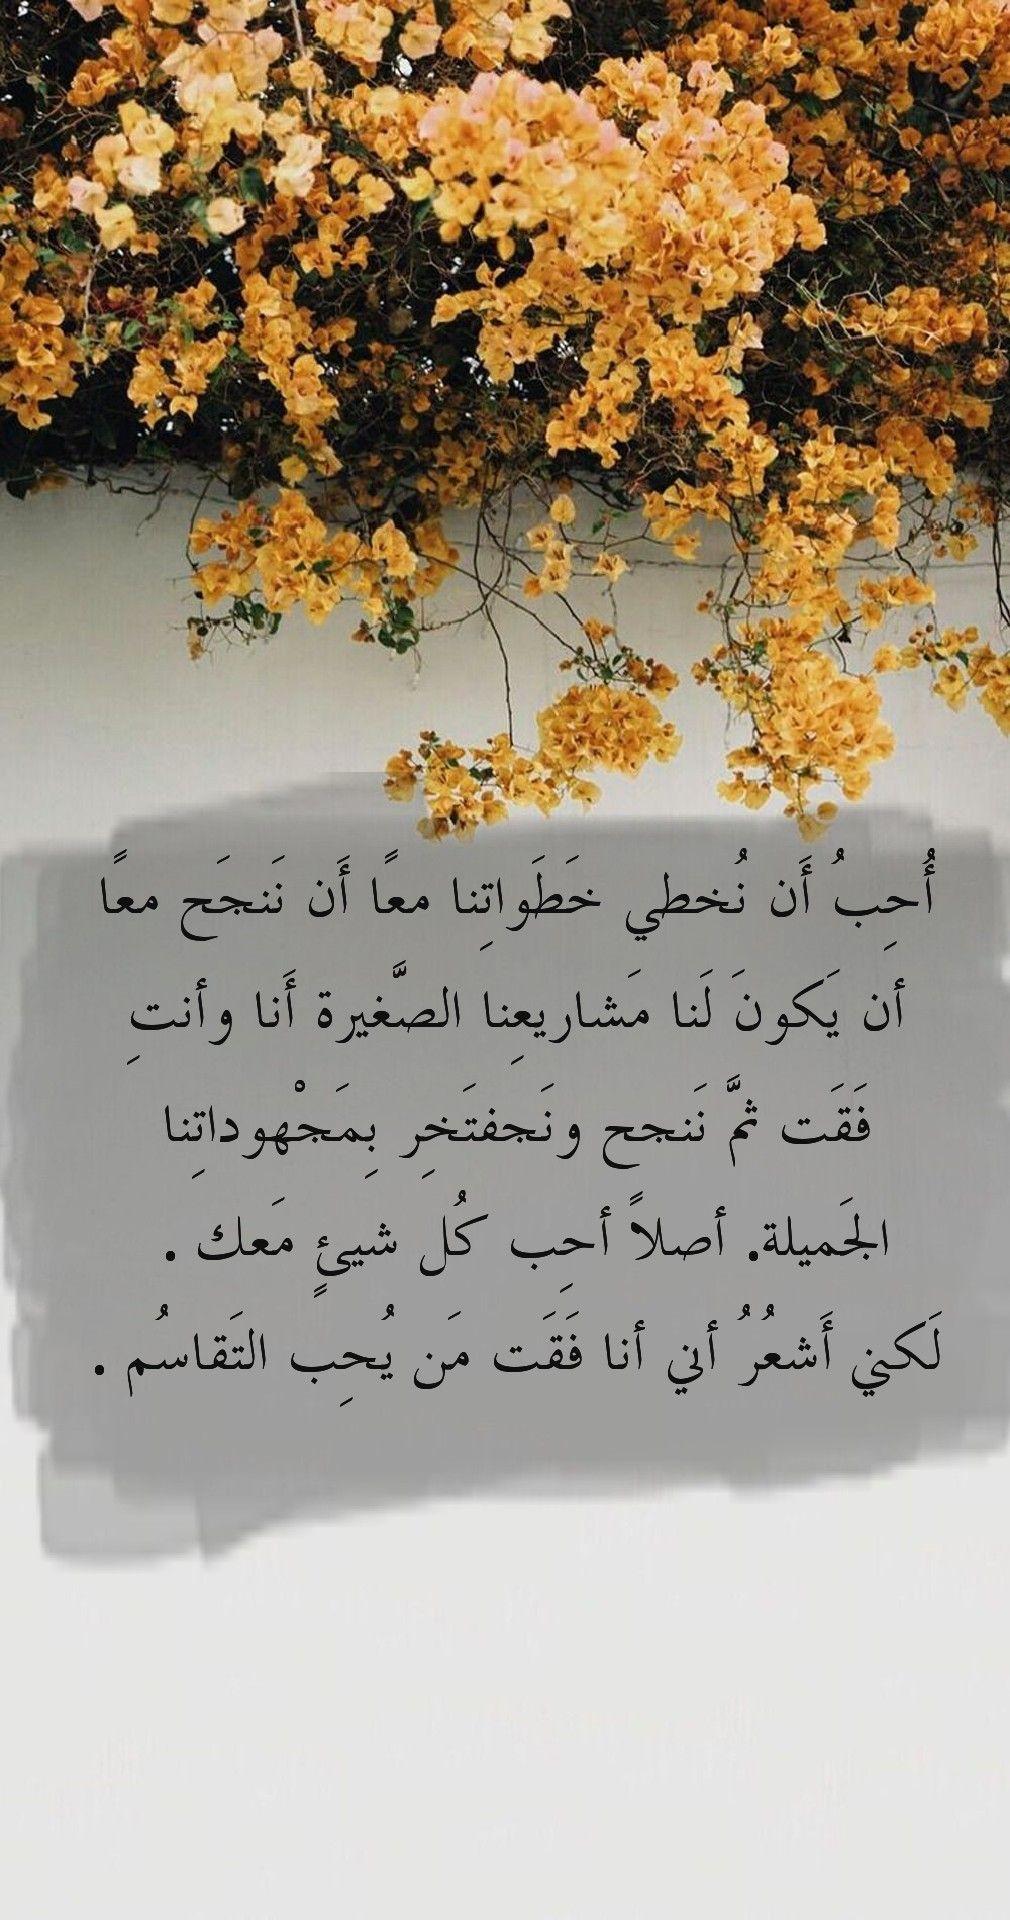 حب حبيبي احبك اعشقك وفاء عمري قمري نجمي وردة وردتي سلام محبة Beautiful Quotes Beautiful Quotes